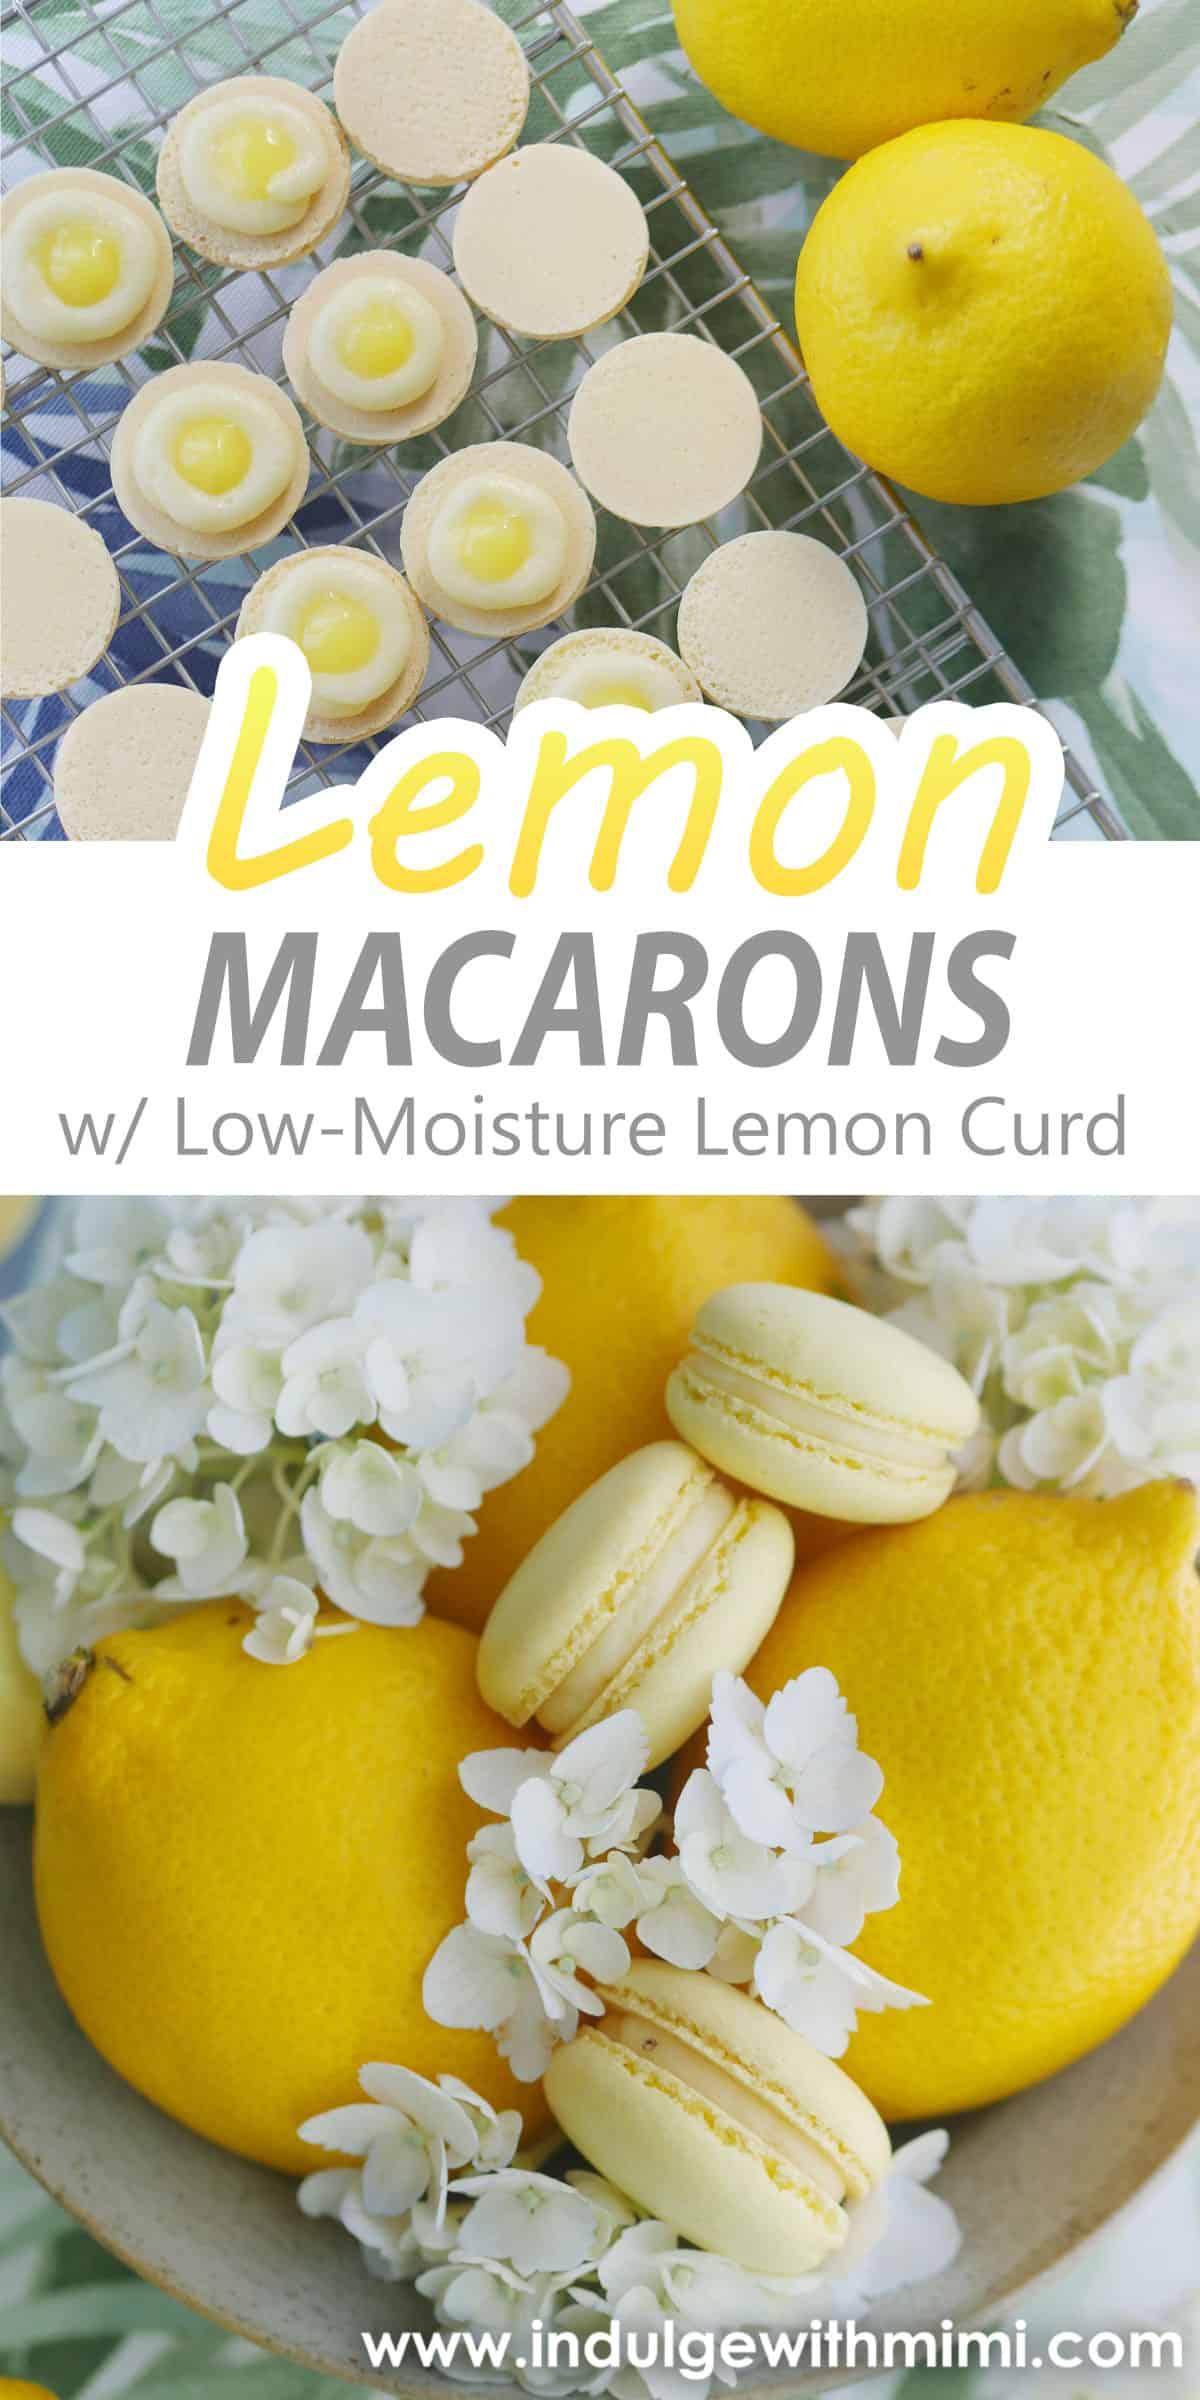 Three macarons sitting on three lemons with flowers.